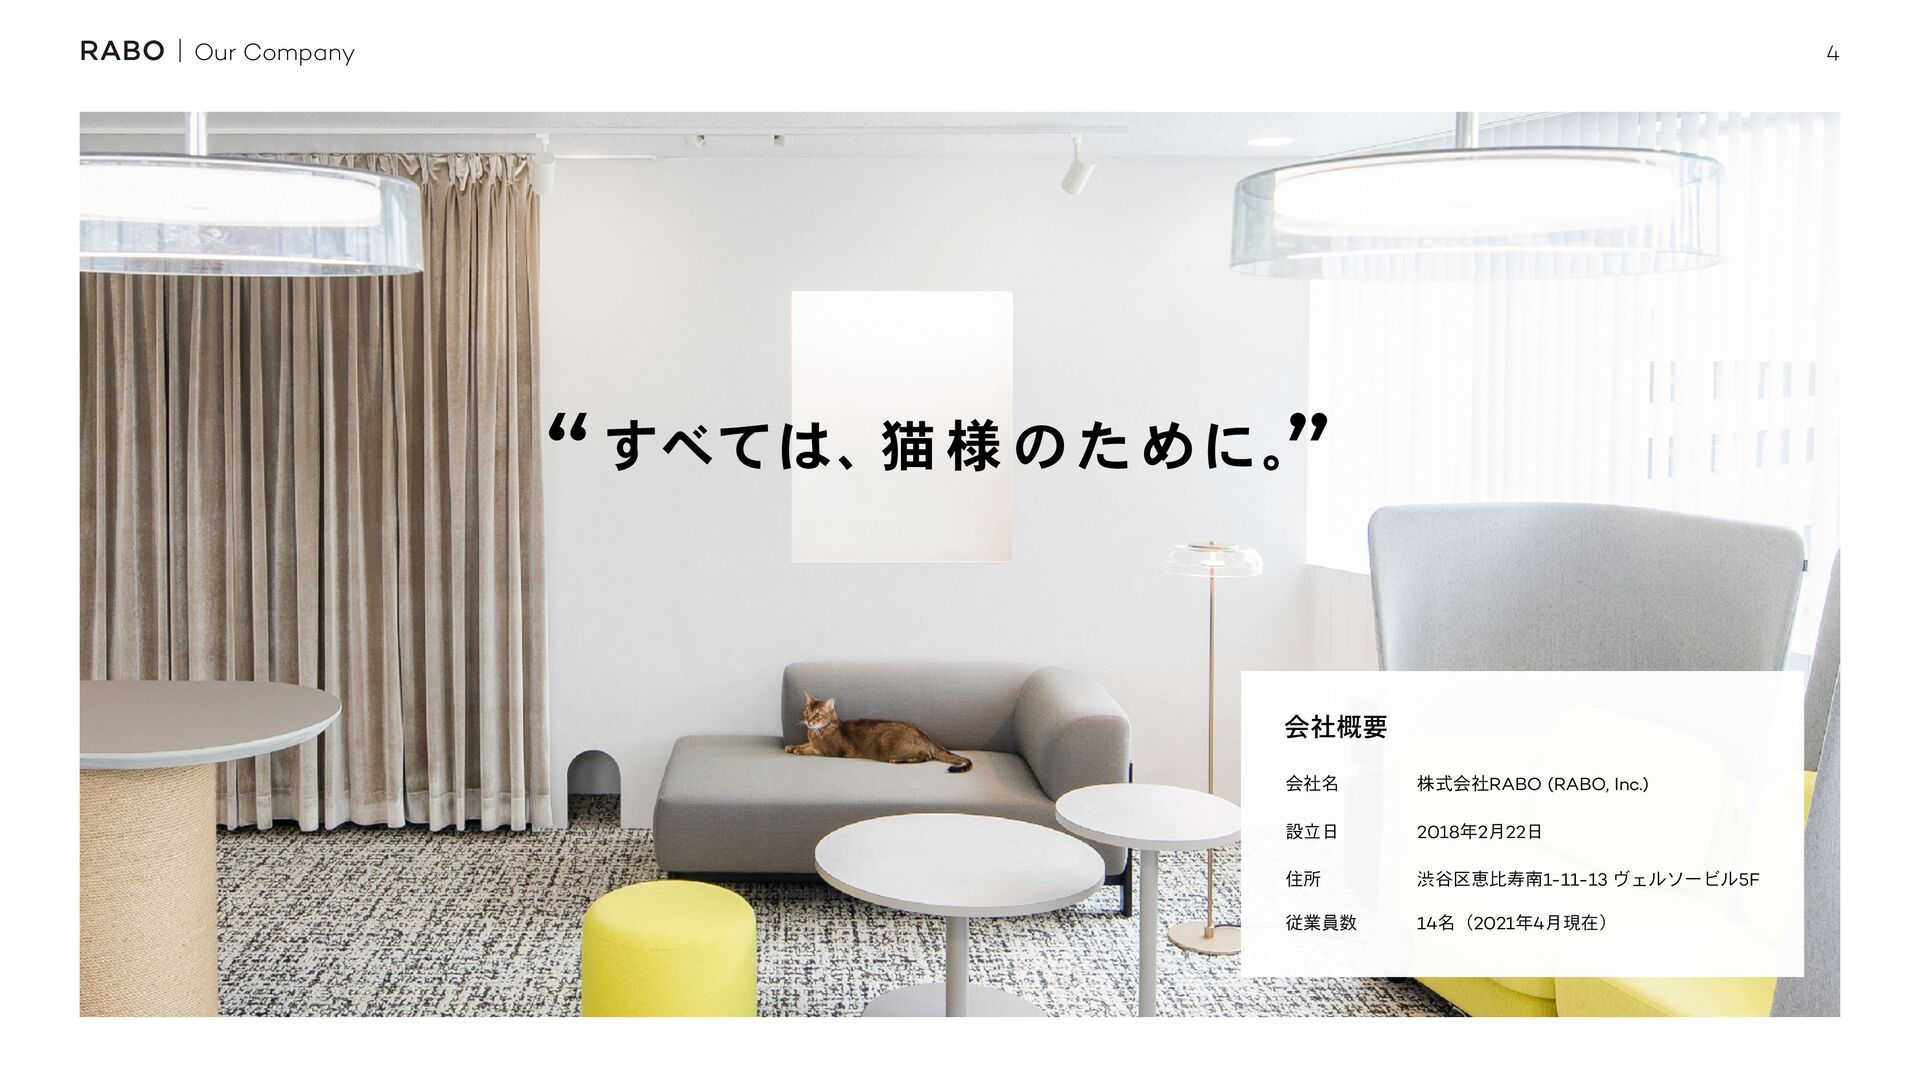 "4 Our Company ͯ͢ɺೣ ༷ ͷͨΊʹɻ "" "" ձ໊ࣾ גࣜձࣾRABO (..."